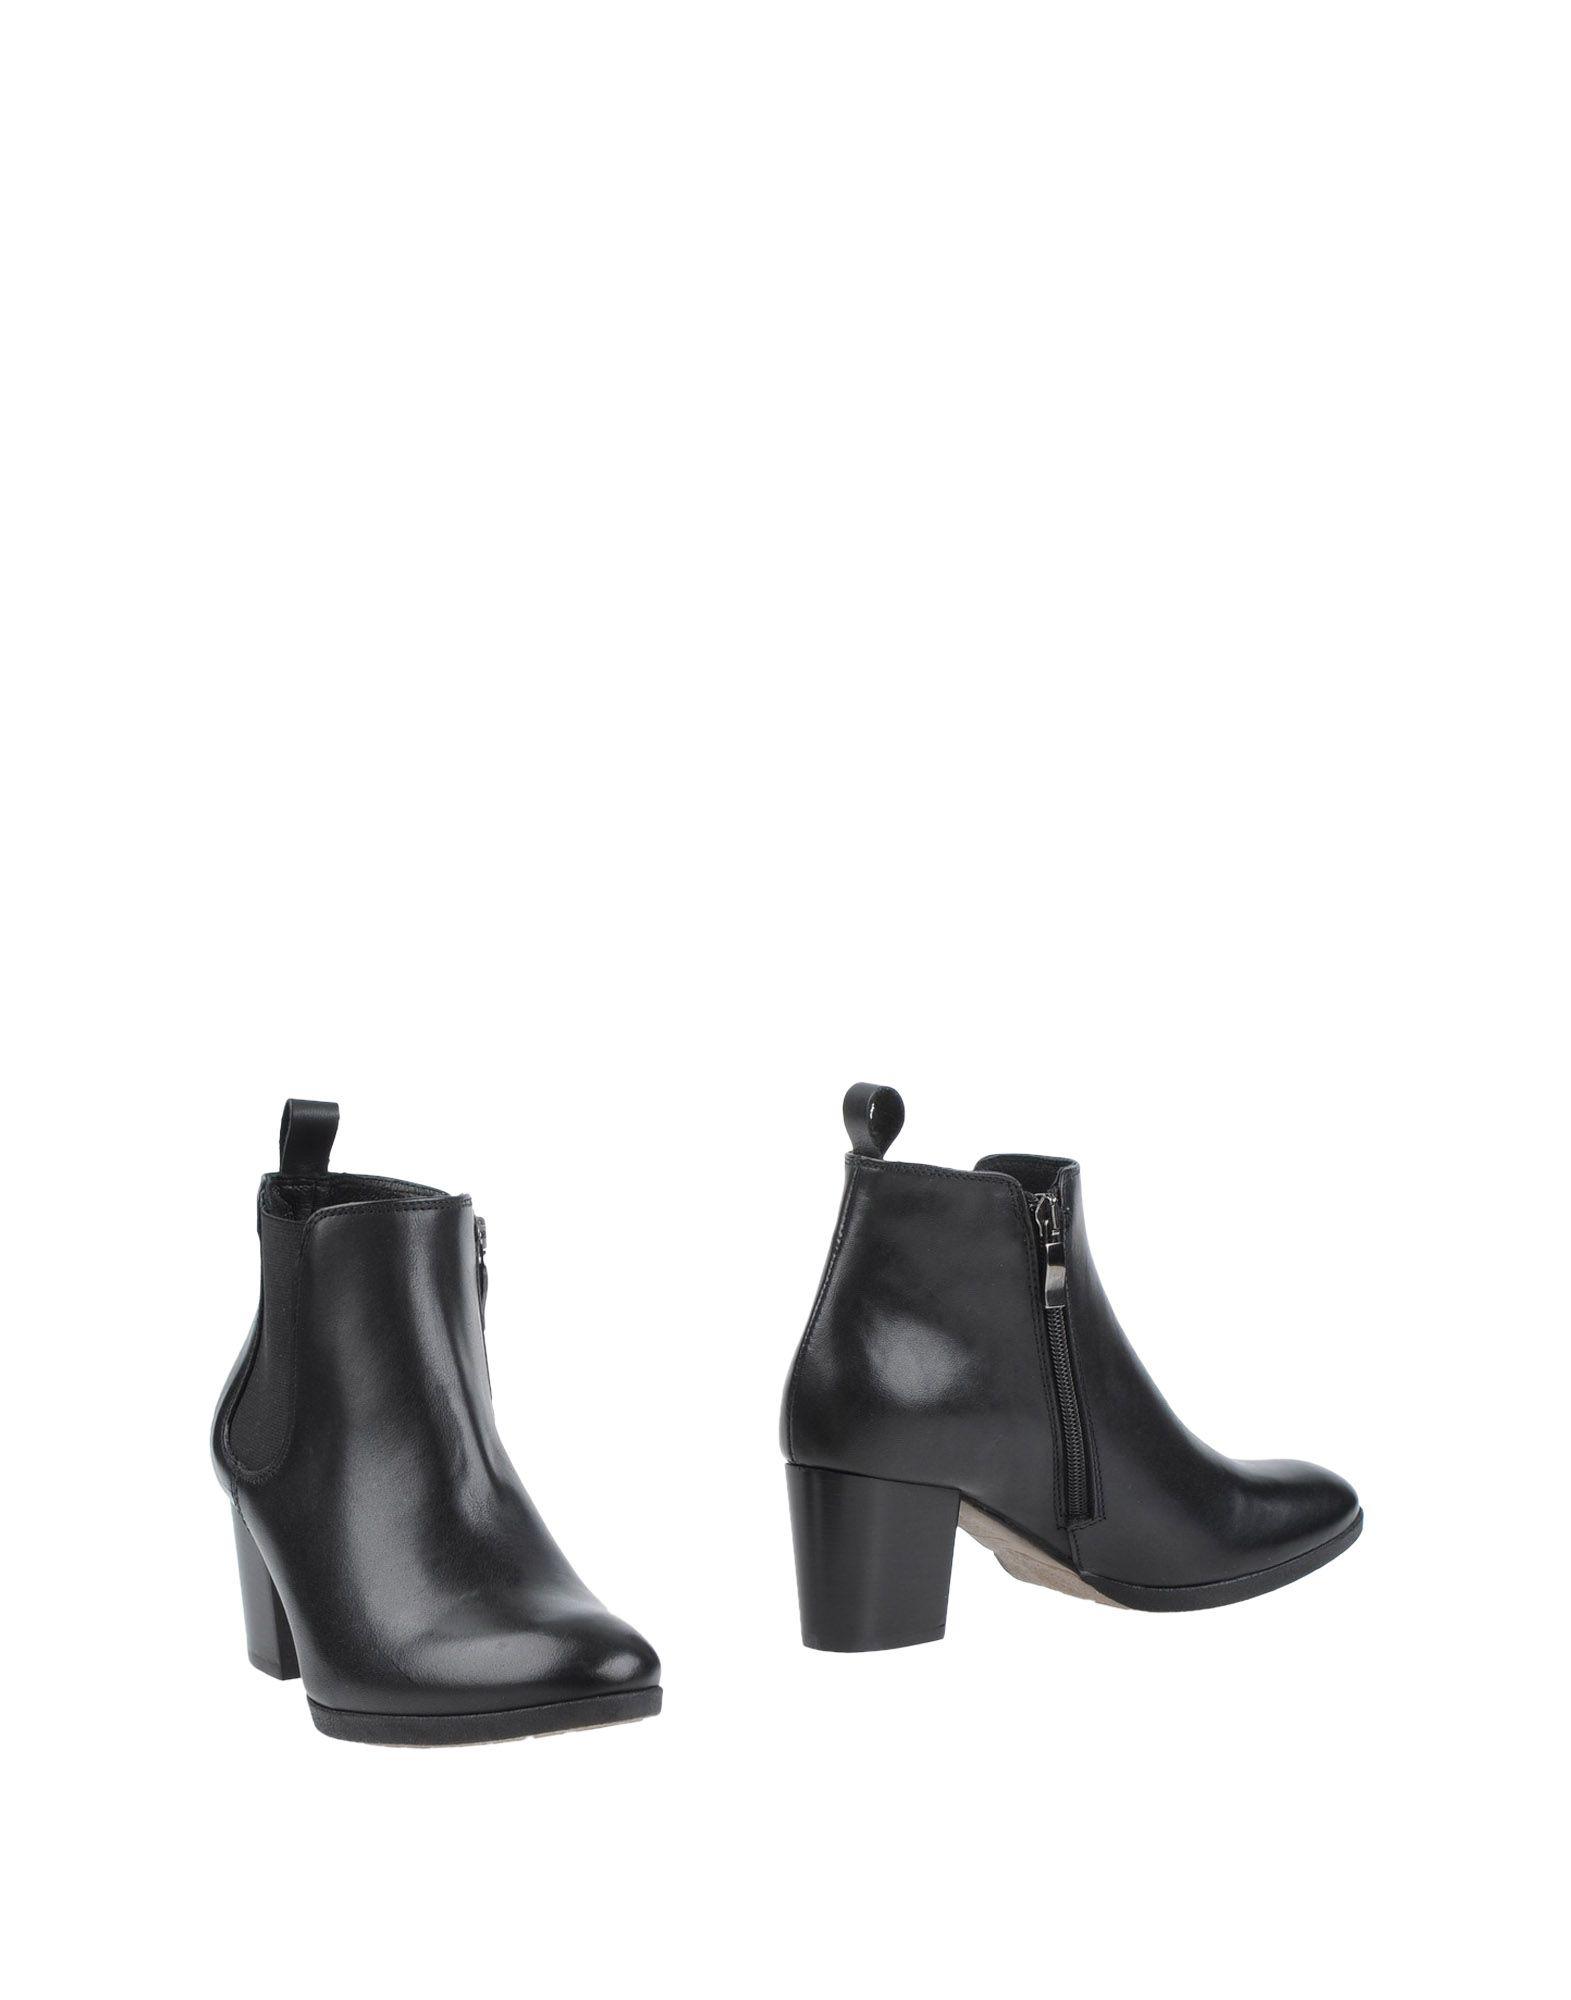 MALLY Полусапоги и высокие ботинки magazzini del sale полусапоги и высокие ботинки